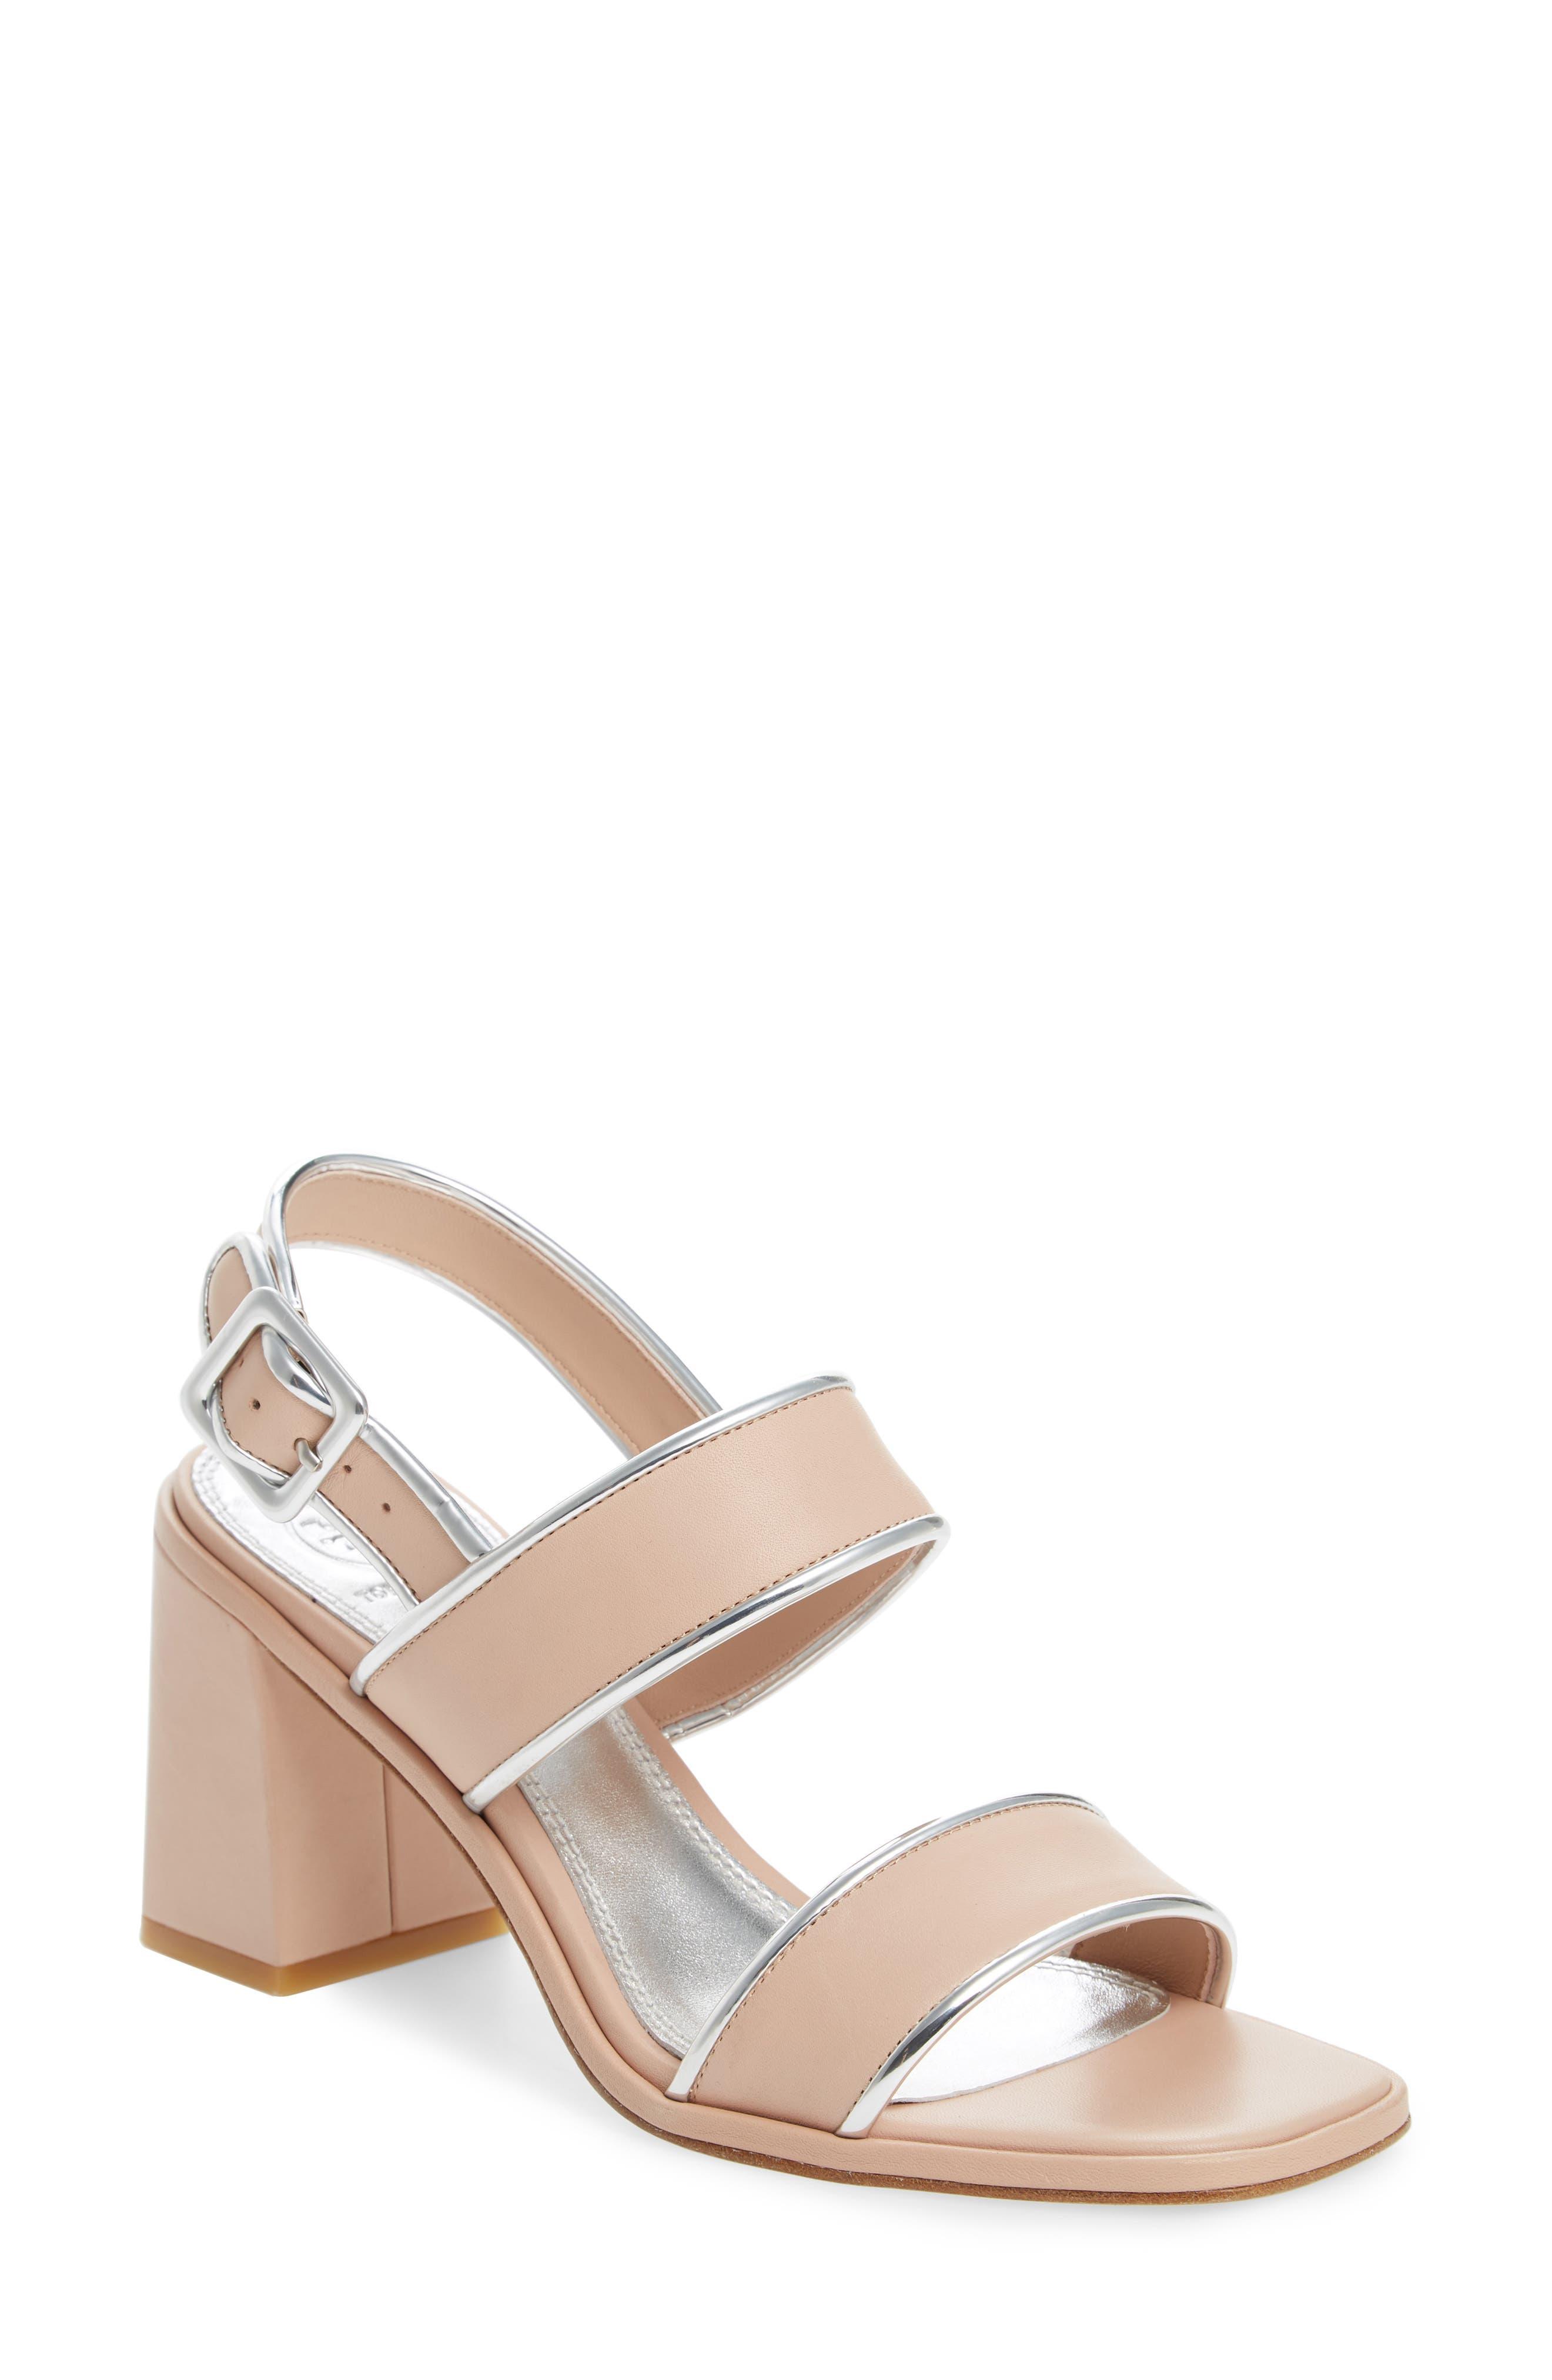 Delaney Double Strap Sandal,                             Main thumbnail 1, color,                             Goan Sand/ Silver